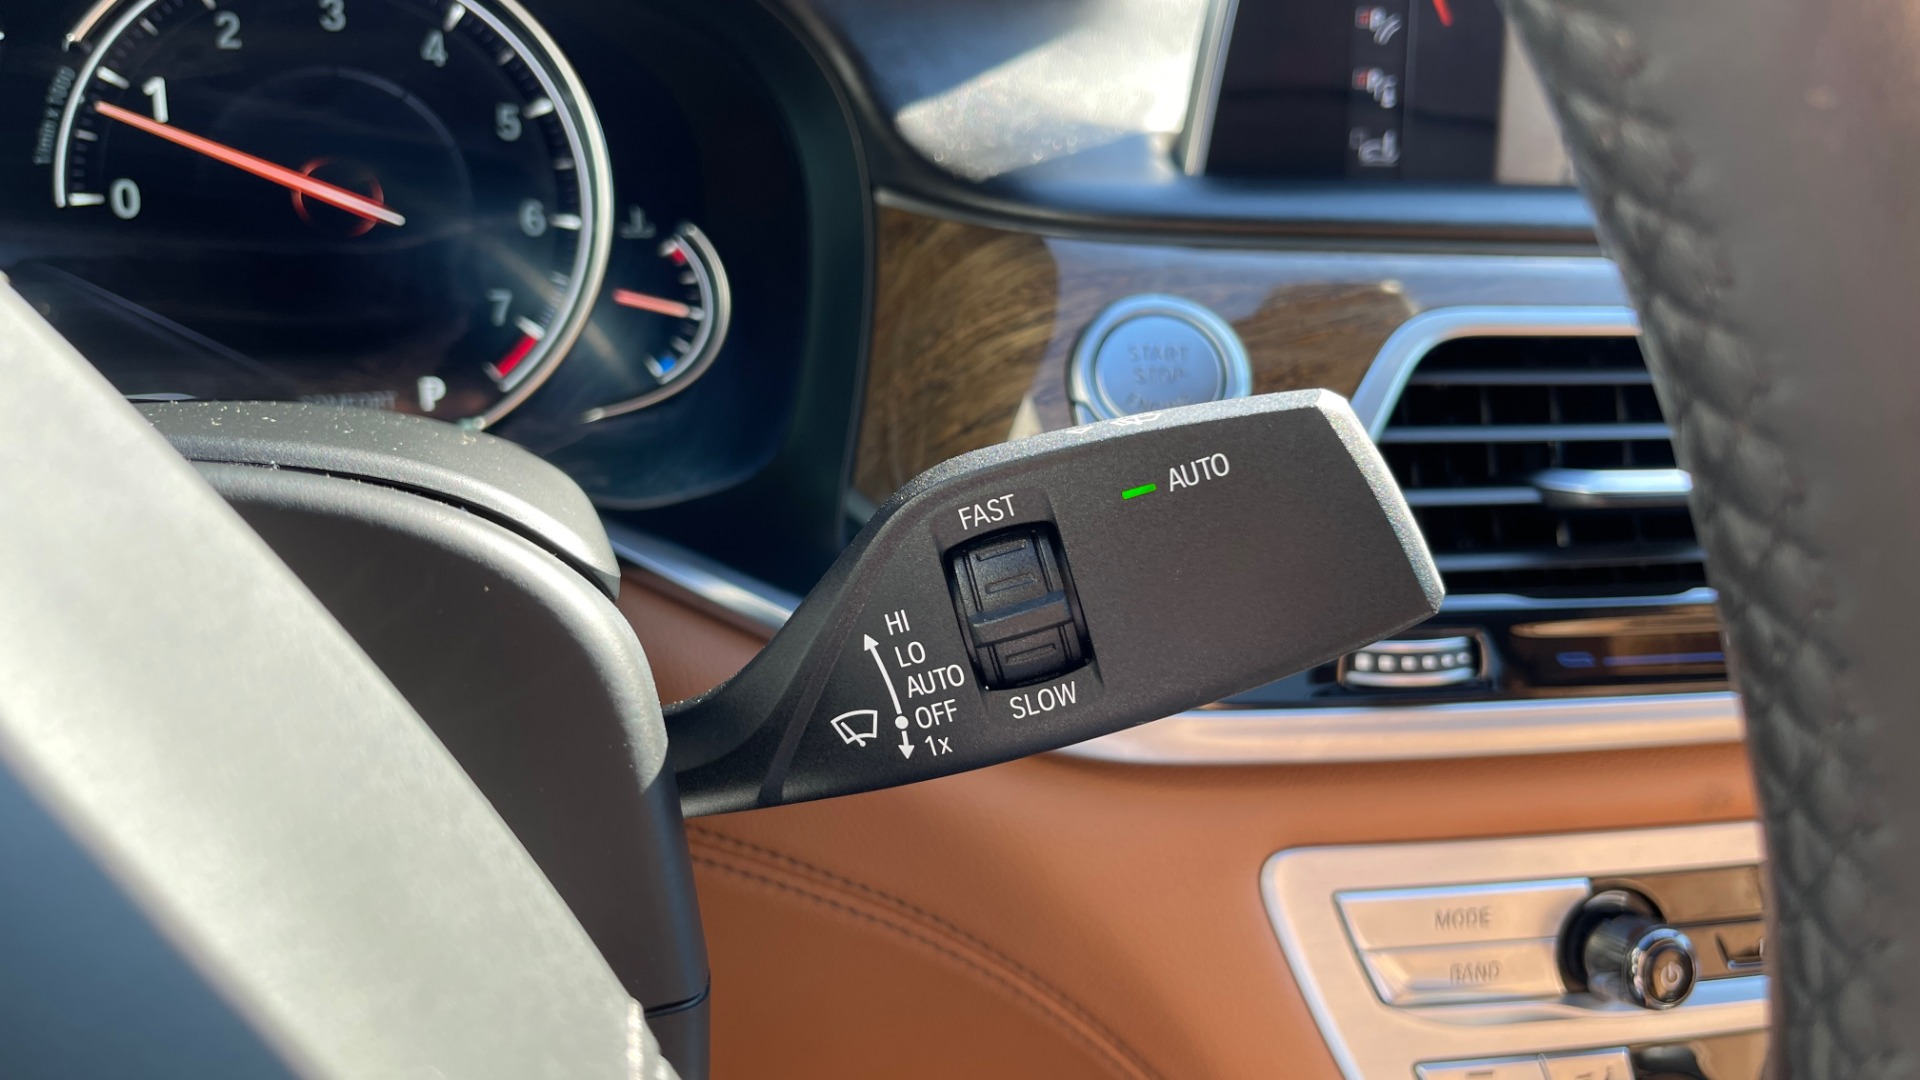 Used 2019 BMW 7 SERIES 750I XDRIVE M-SPORT / EXEC PKG / DRVR ASST PLUS / CLD WTHR / PAR for sale $60,995 at Formula Imports in Charlotte NC 28227 32